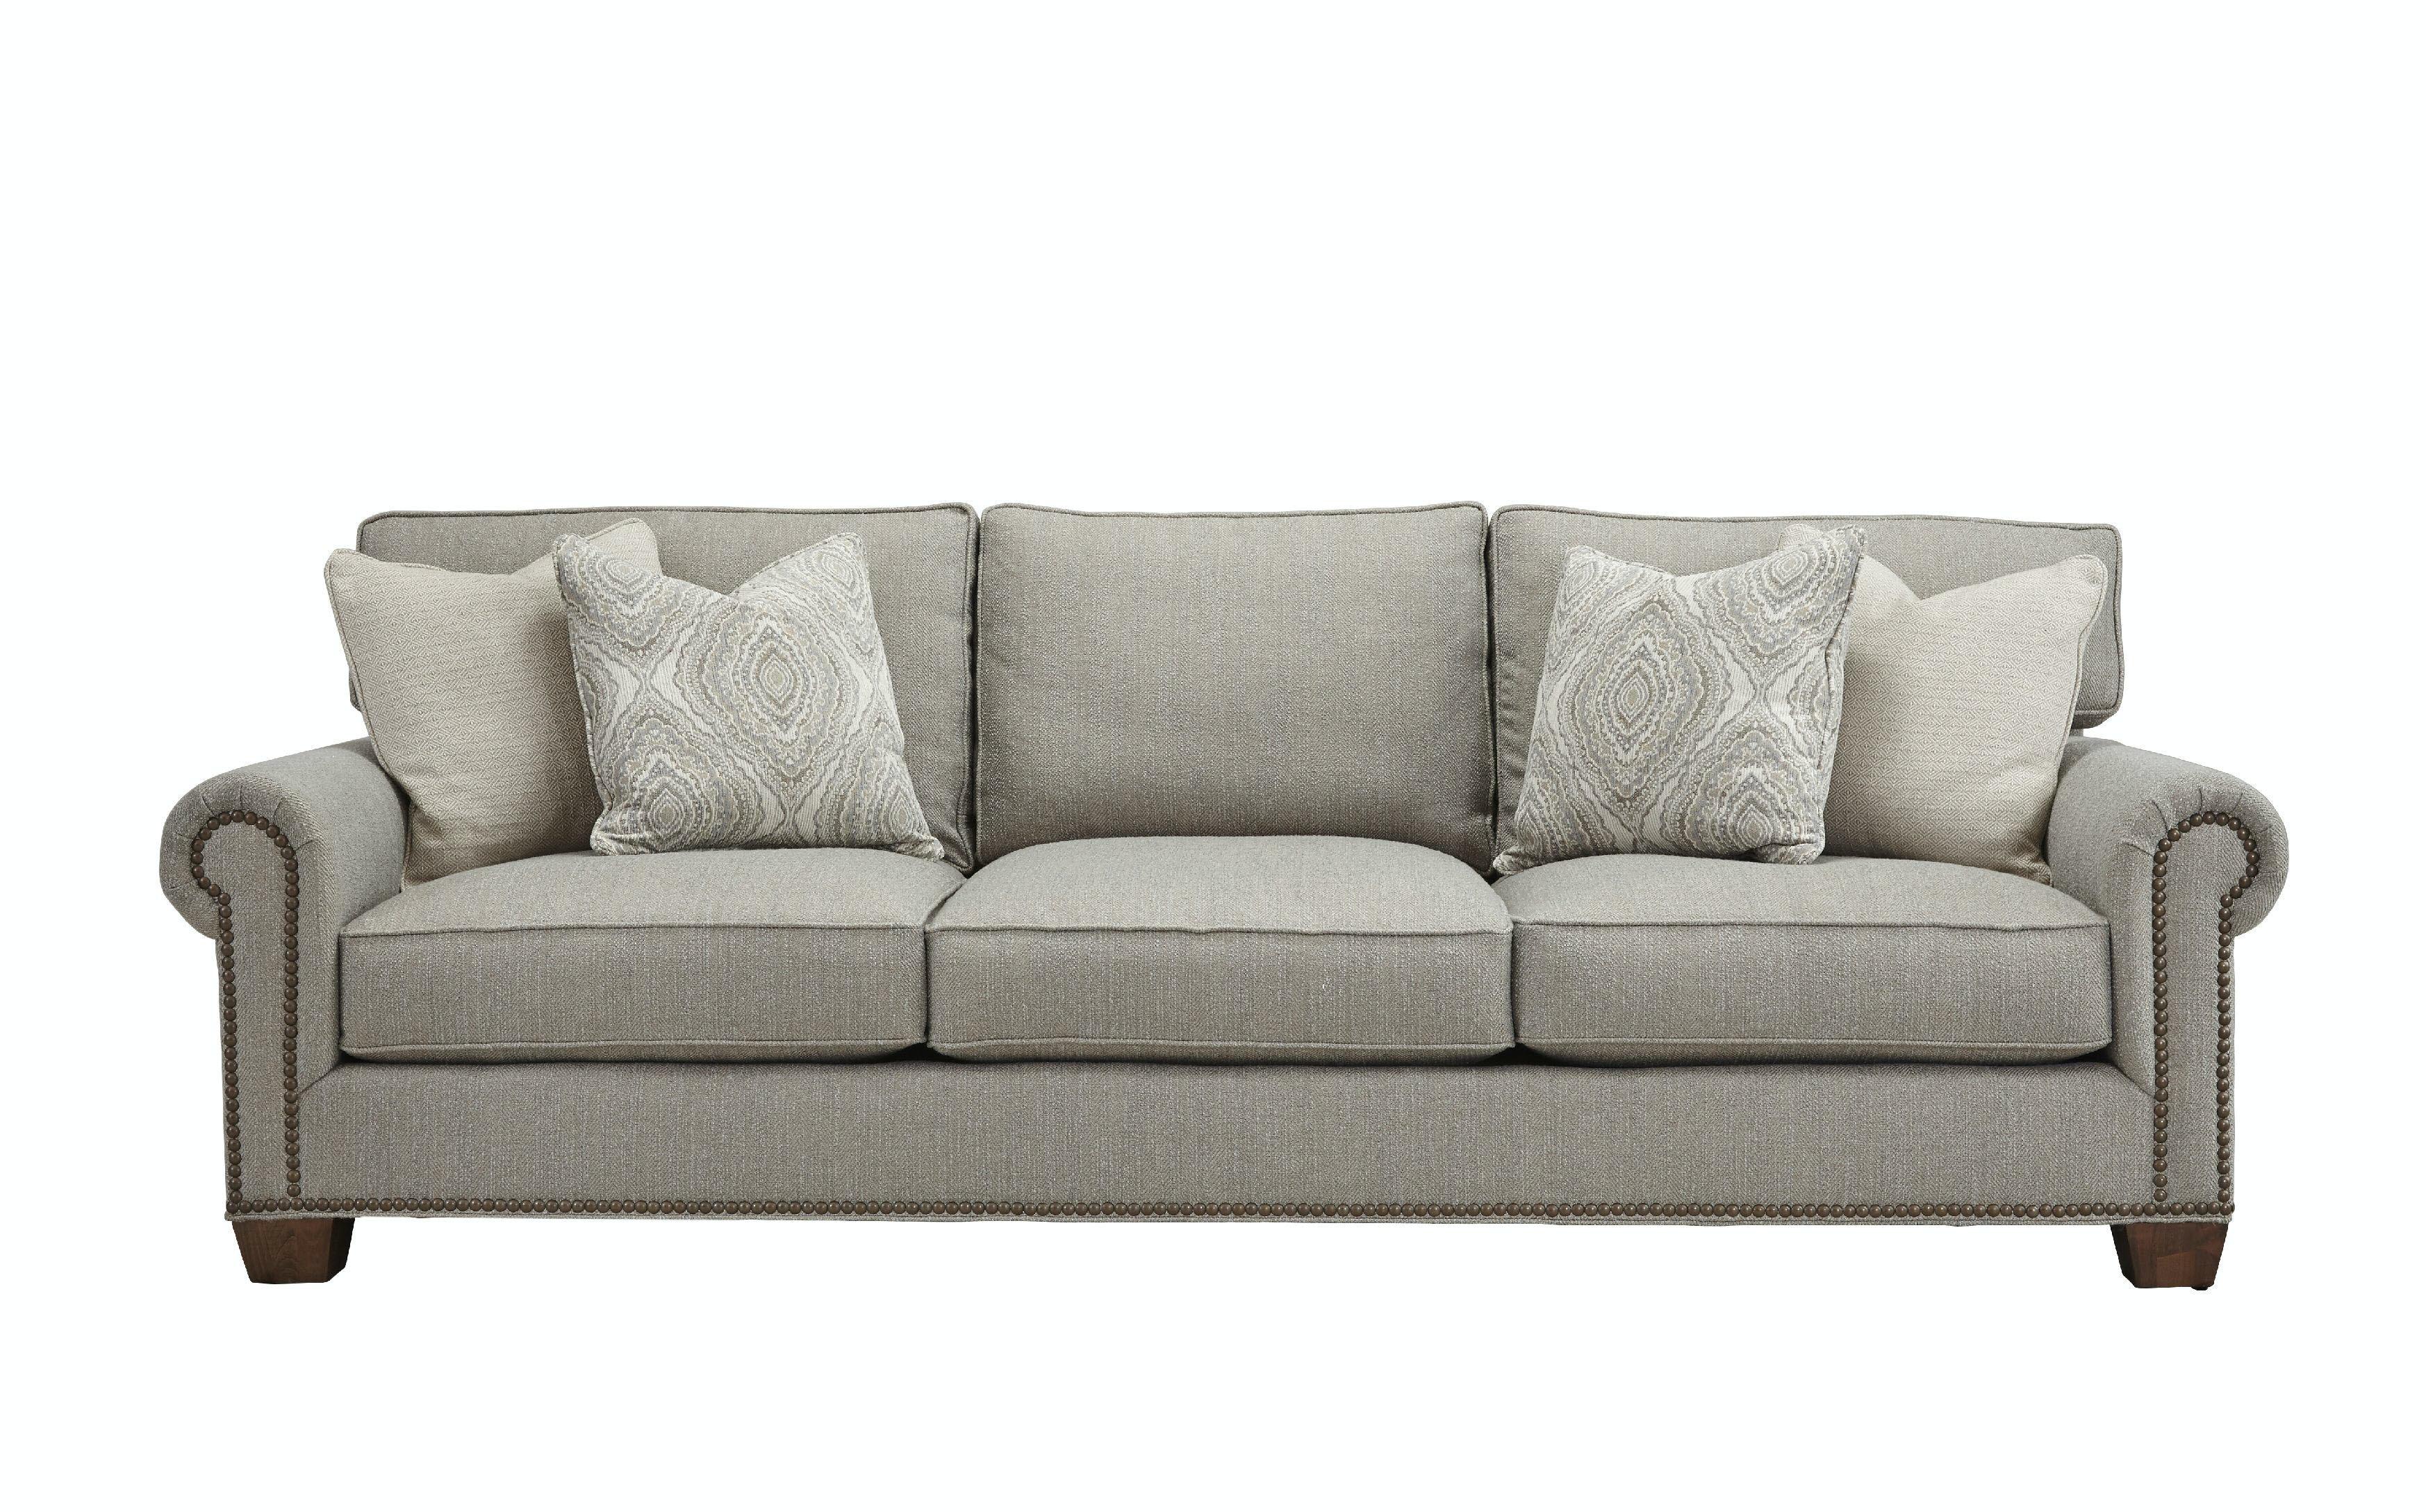 Southern Furniture Burt Sofa 8ft 21361